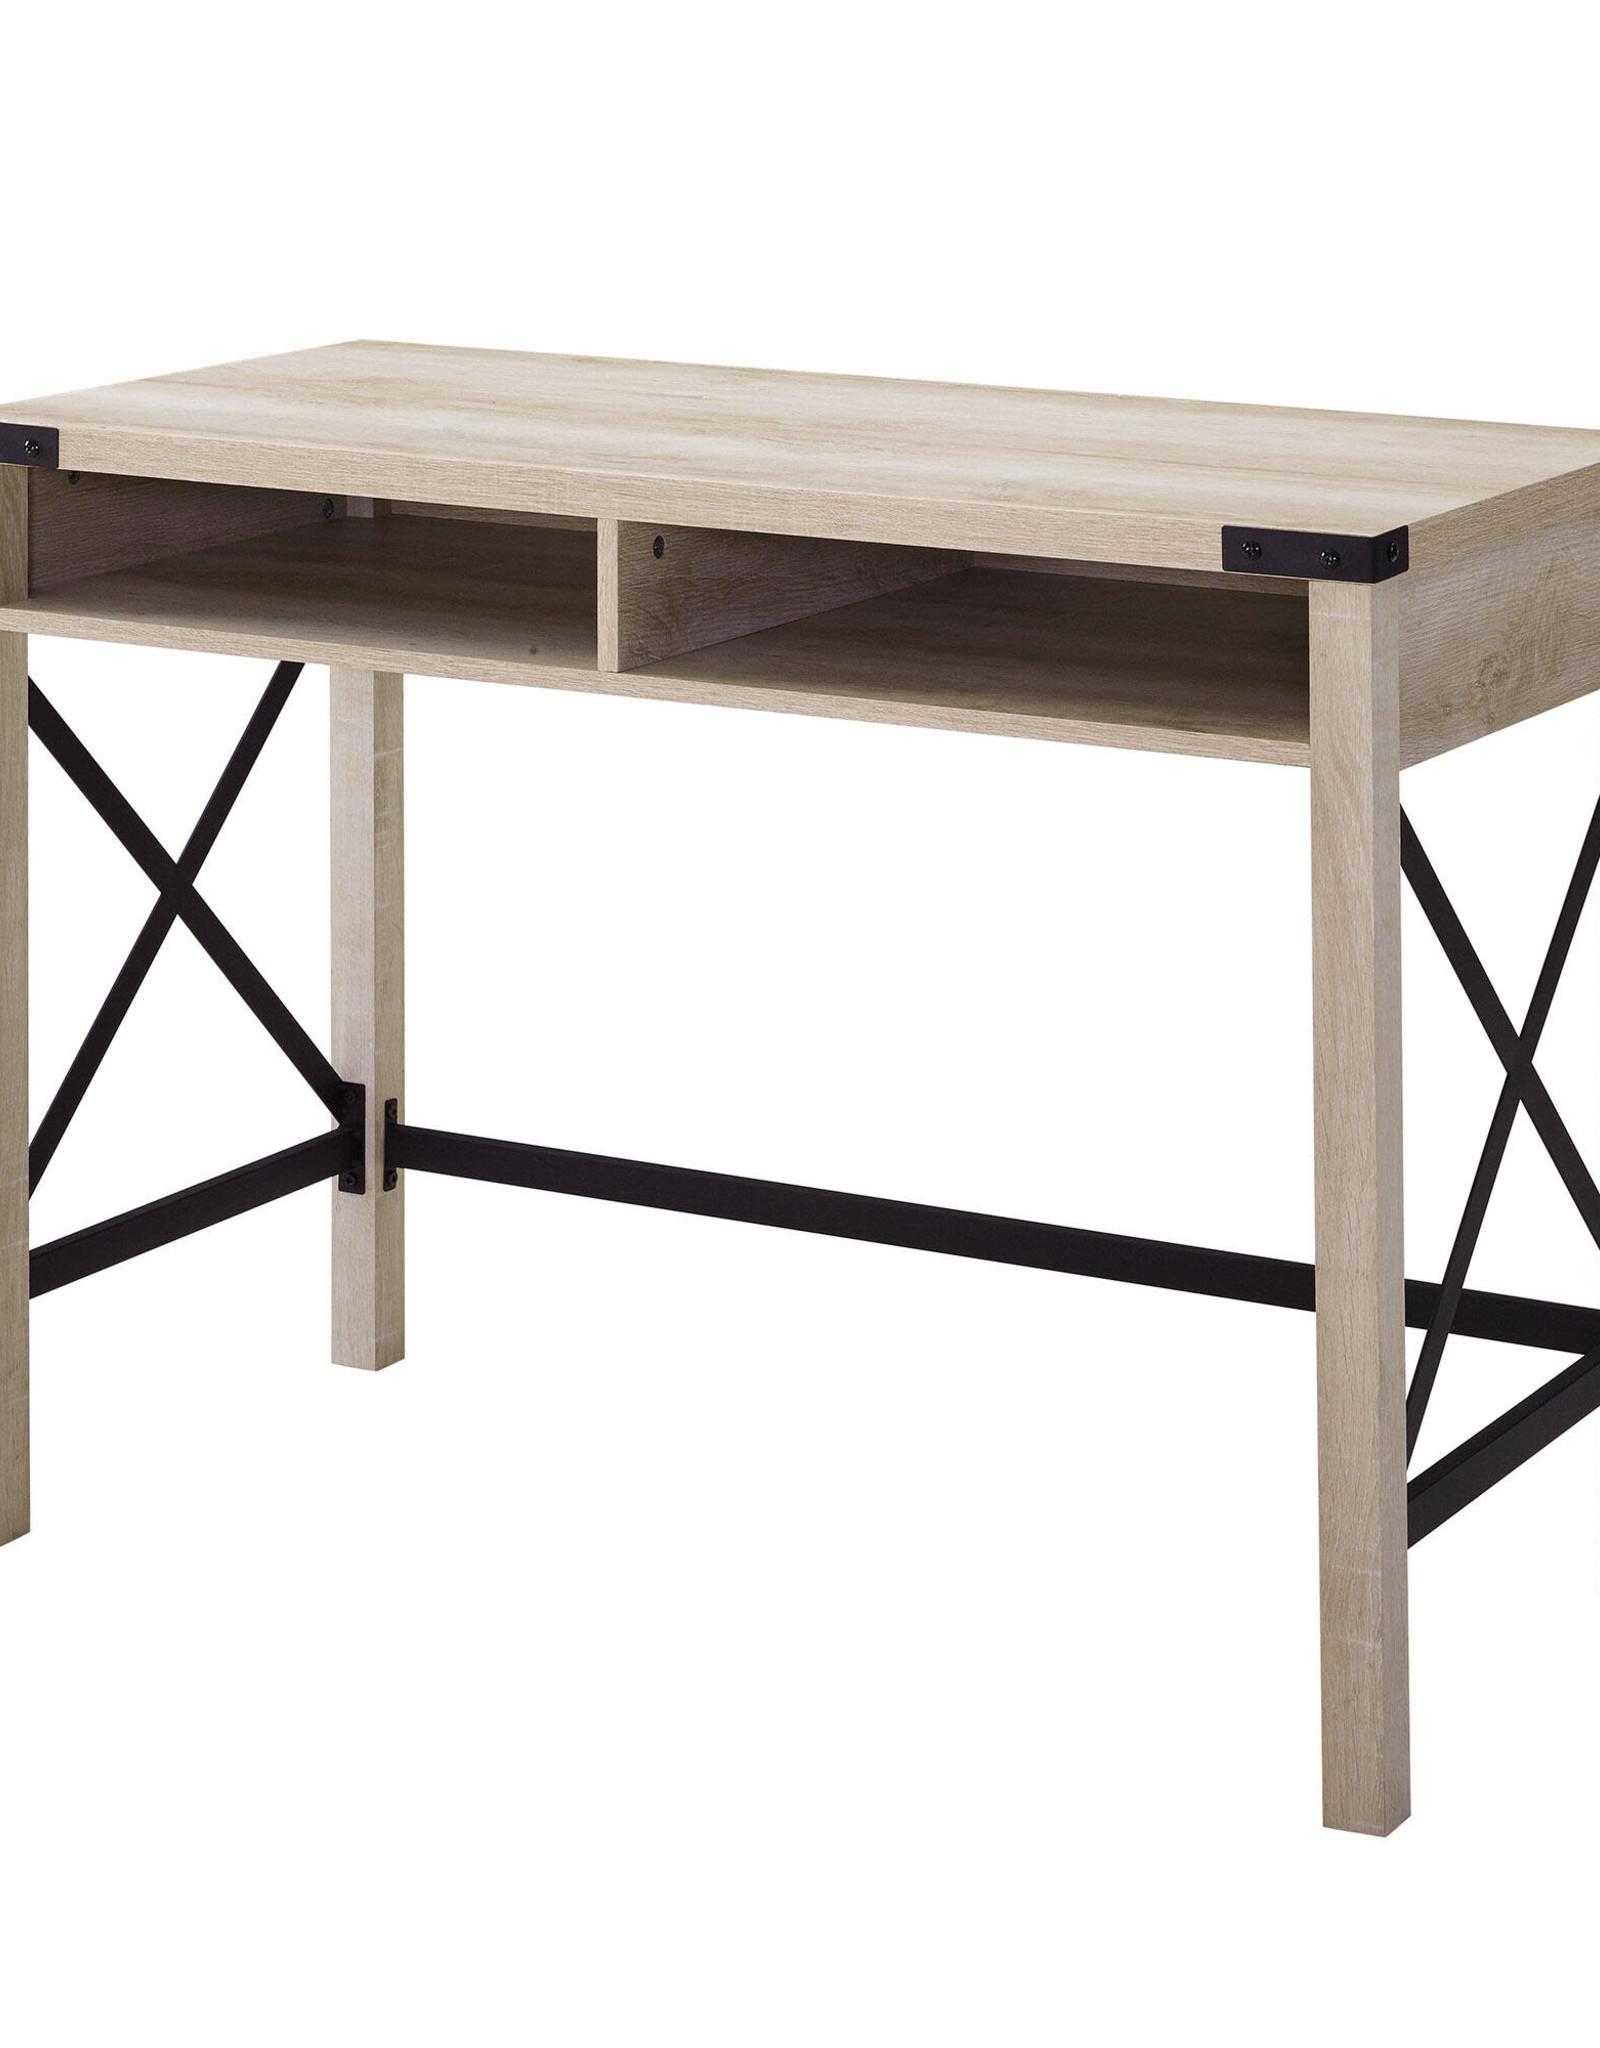 Walker Edison Furniture Company 42 in. Rectangular White Oak Writing Desks with Built-In Storage